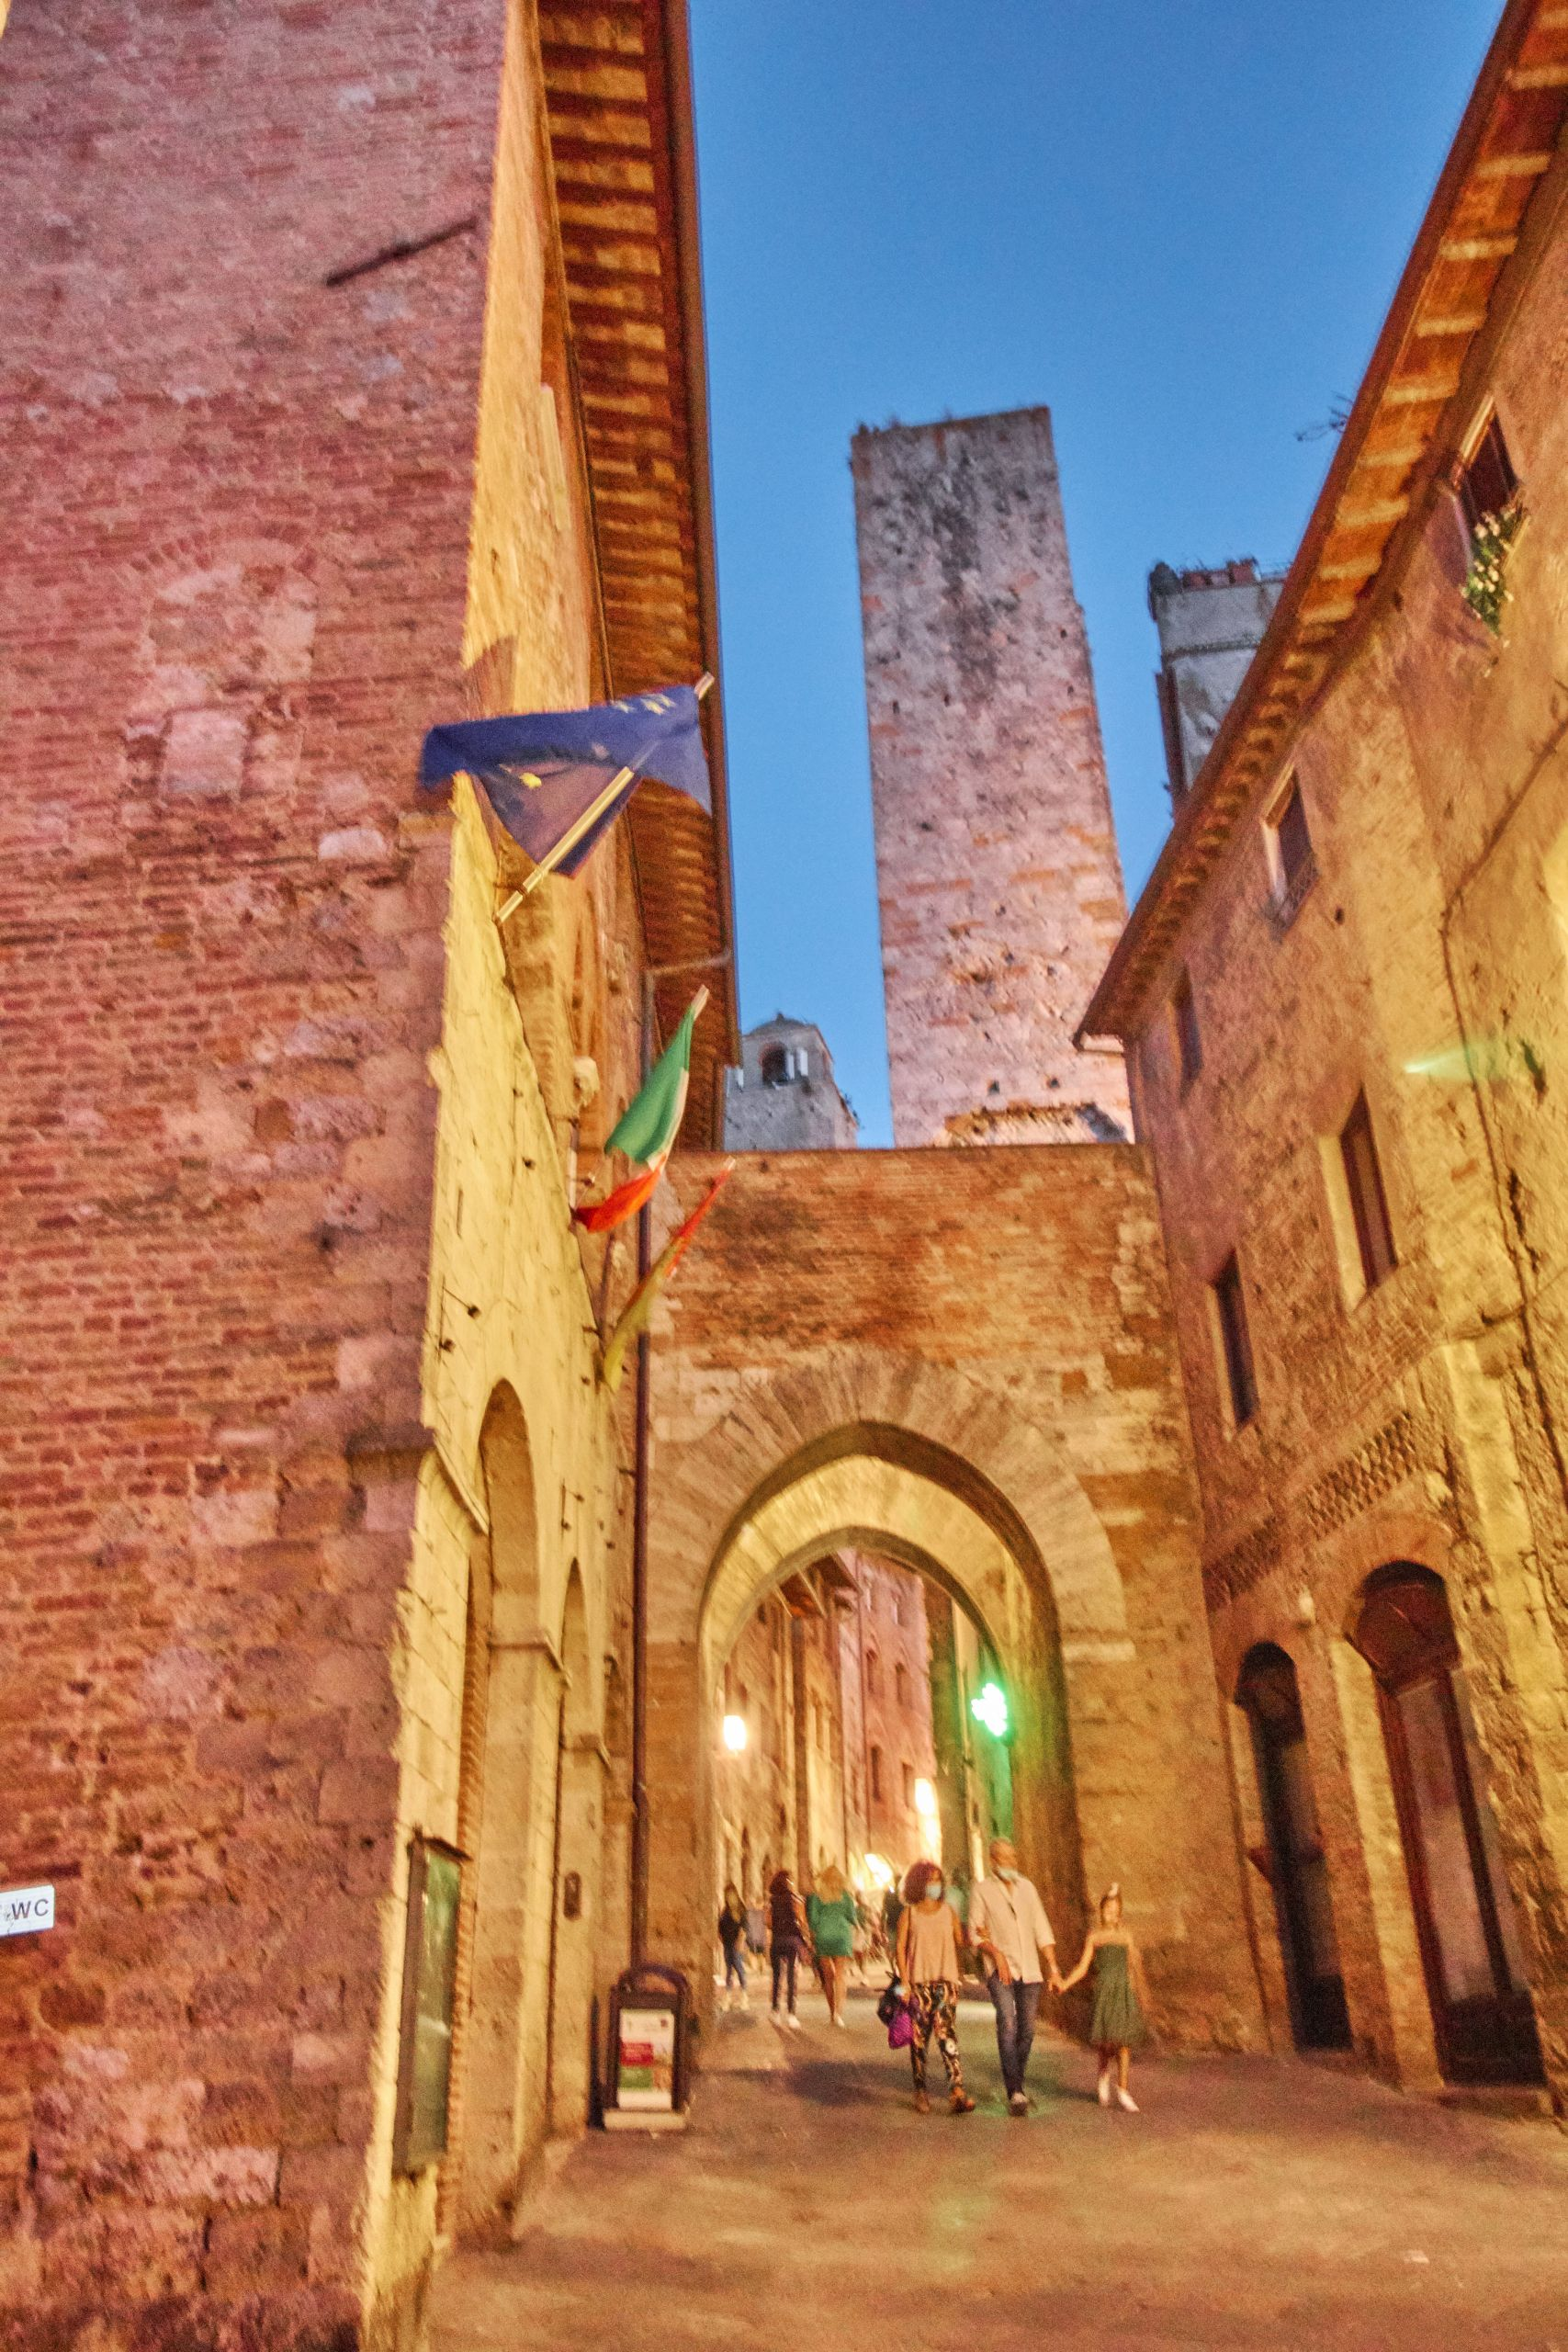 Geschlechterturm in Altstadt von San Gimignano beim Toskana Roadtrip